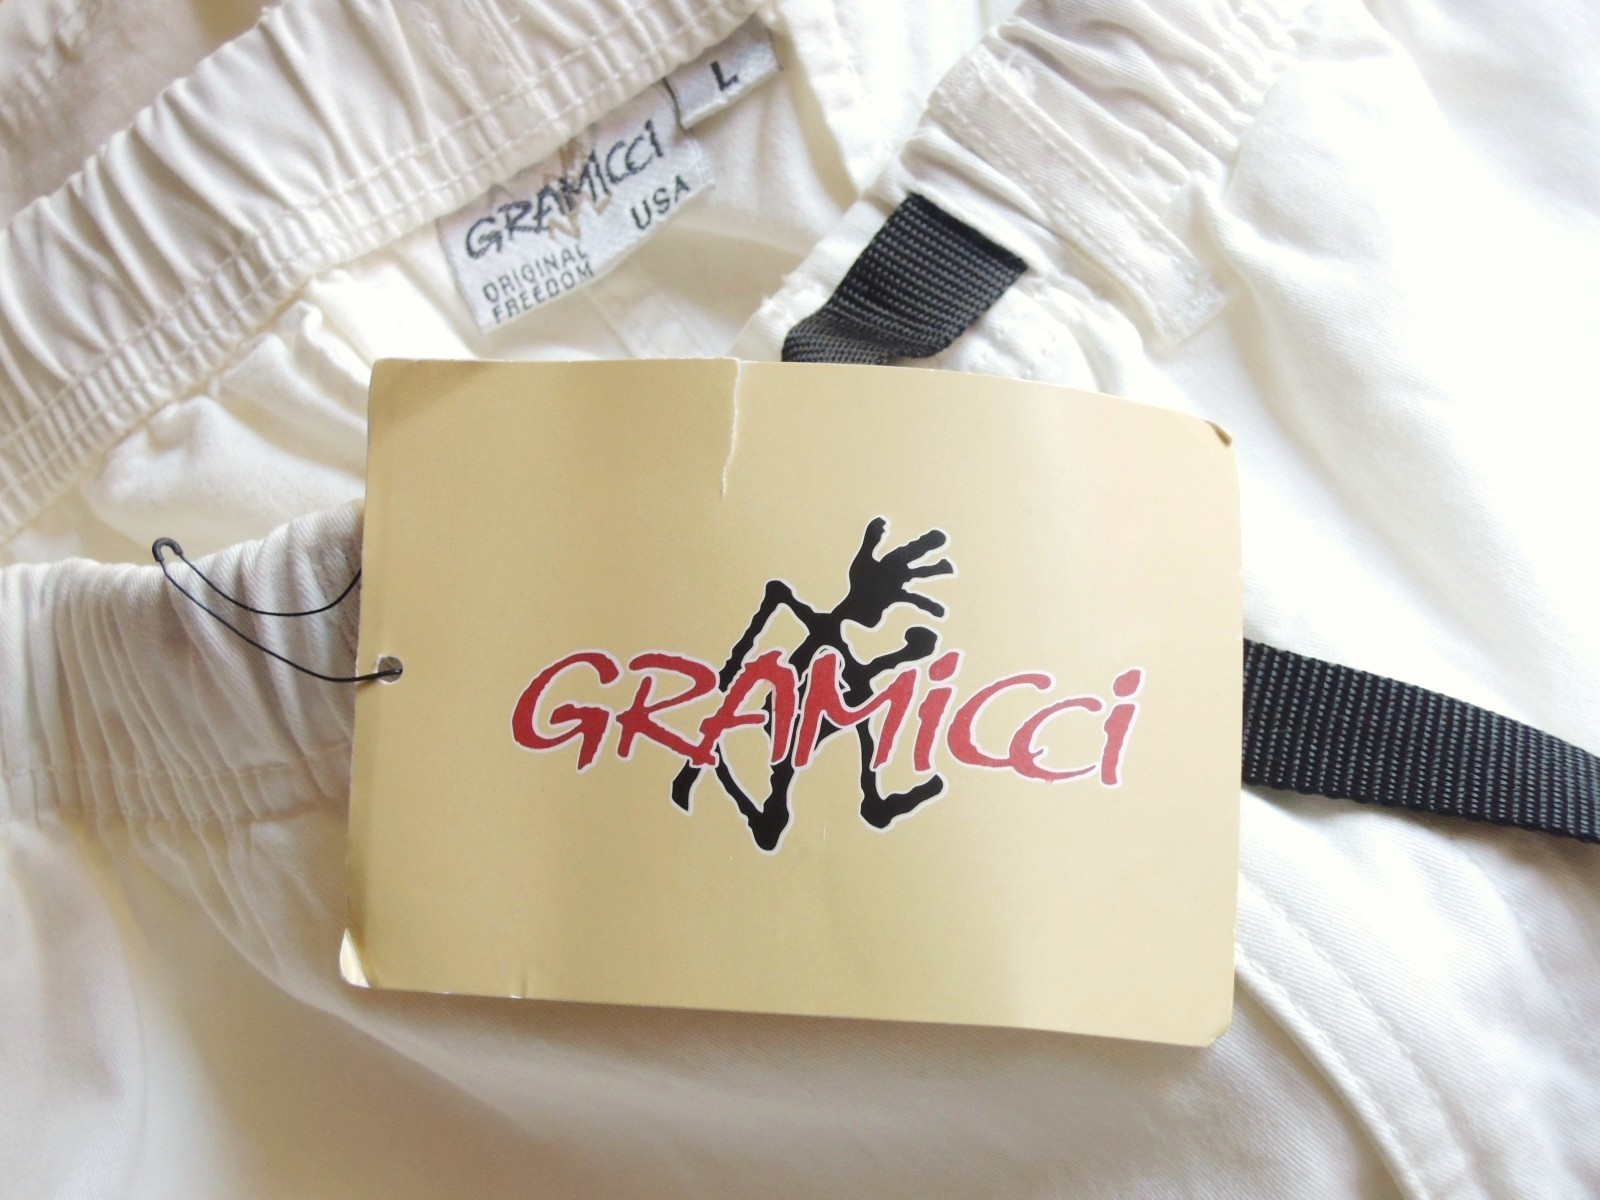 gramicciwhiteshorts02.JPG